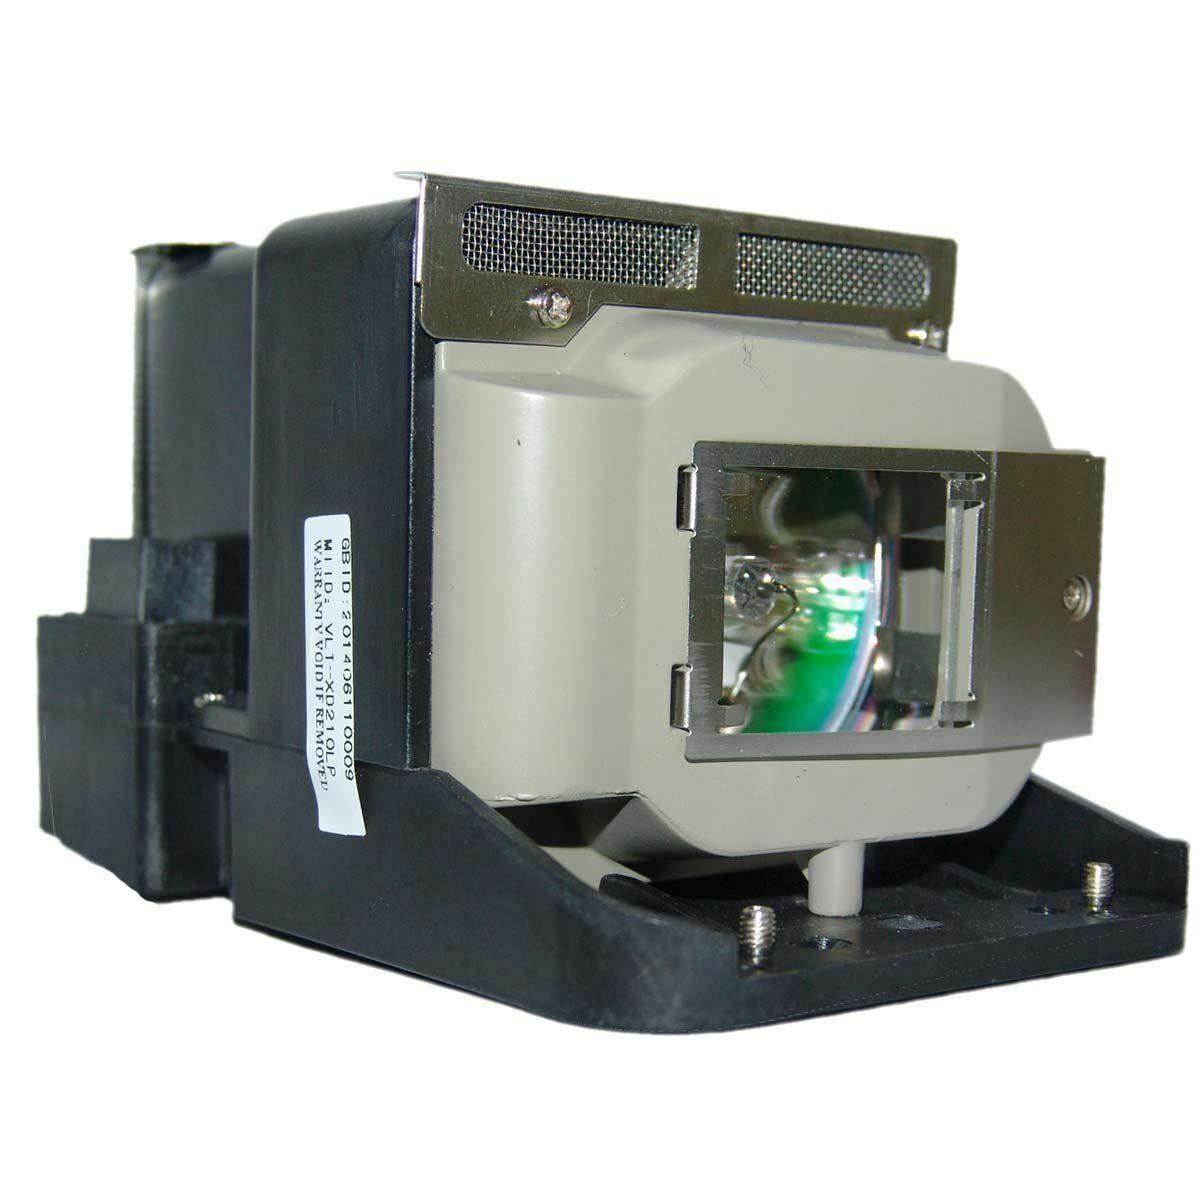 CTLAMP RLC-046 オリジナルランプバルブ ハウジング付き VIEWSONIC PJD6210 / PJD6210-WH / PJD6210-3Dに対応   B07P9Z8DYW